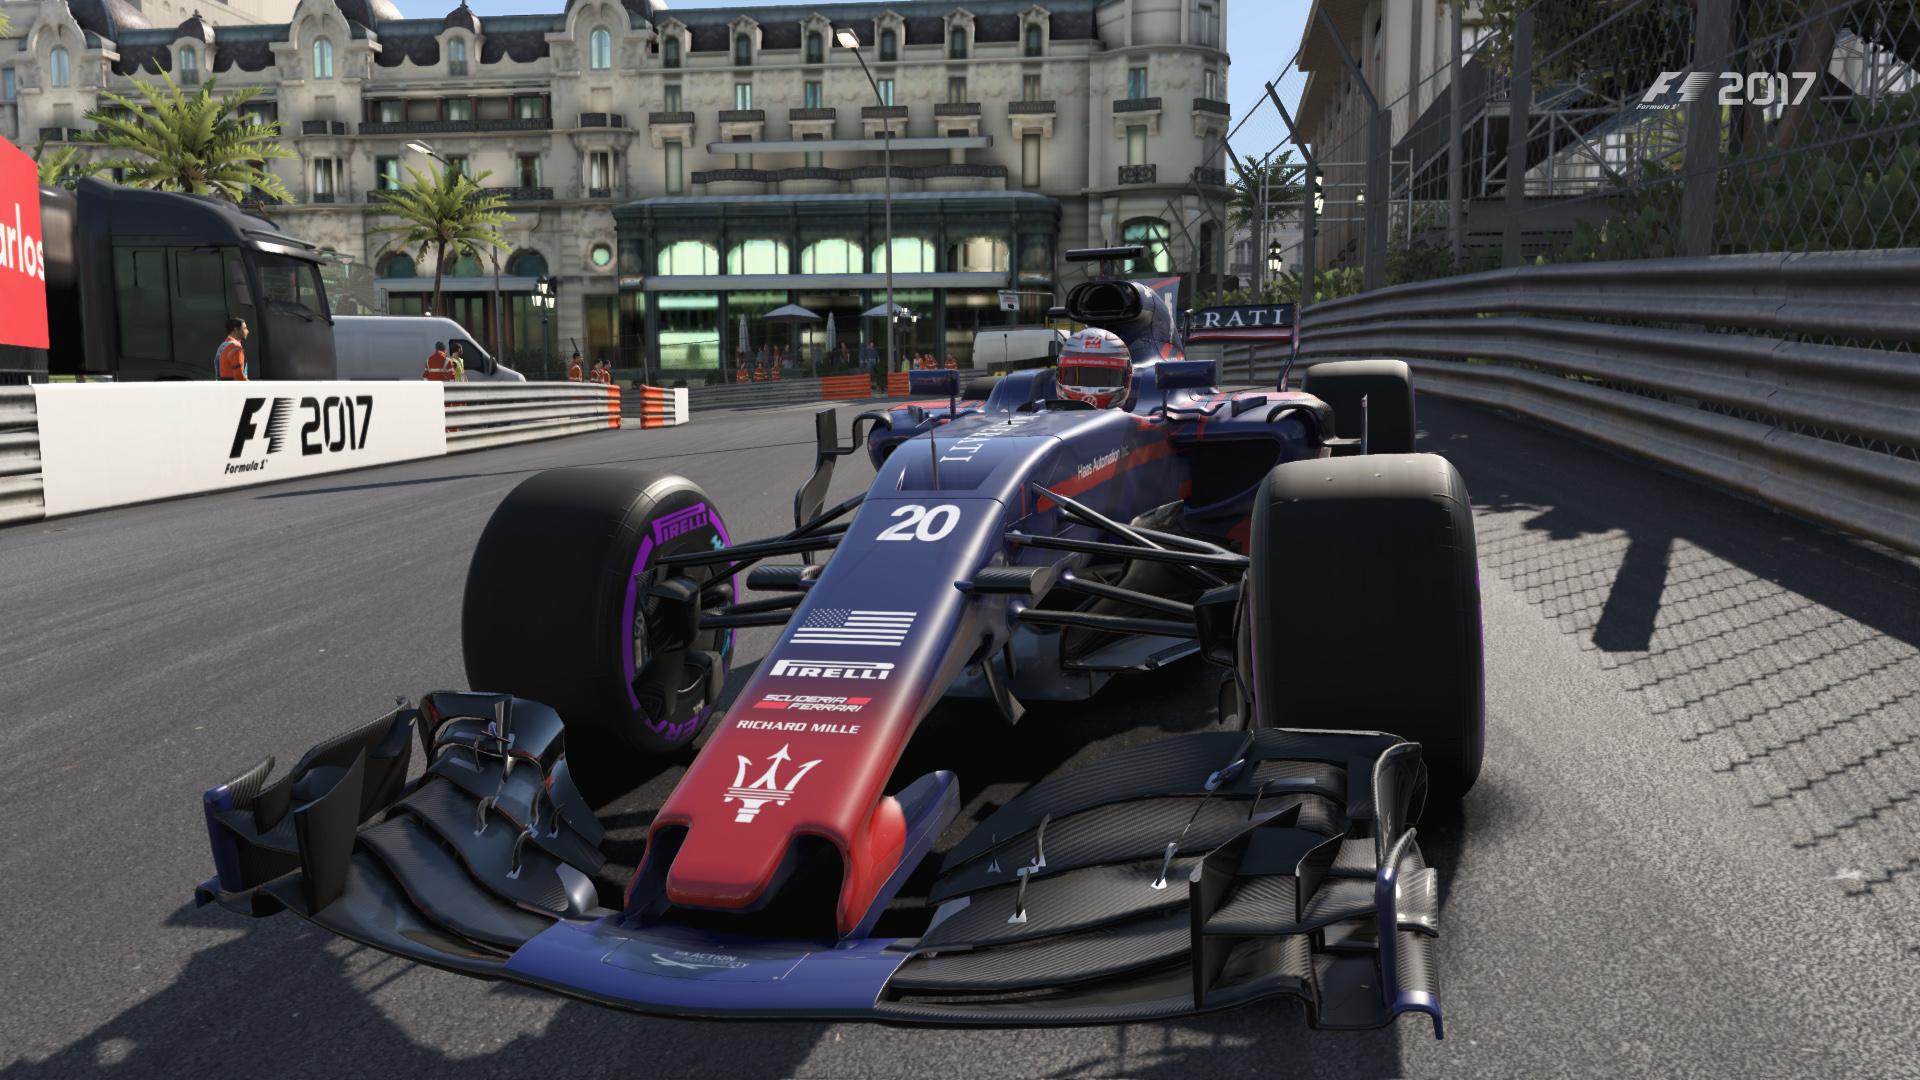 F1_2017_photo_20171228_173115.jpg